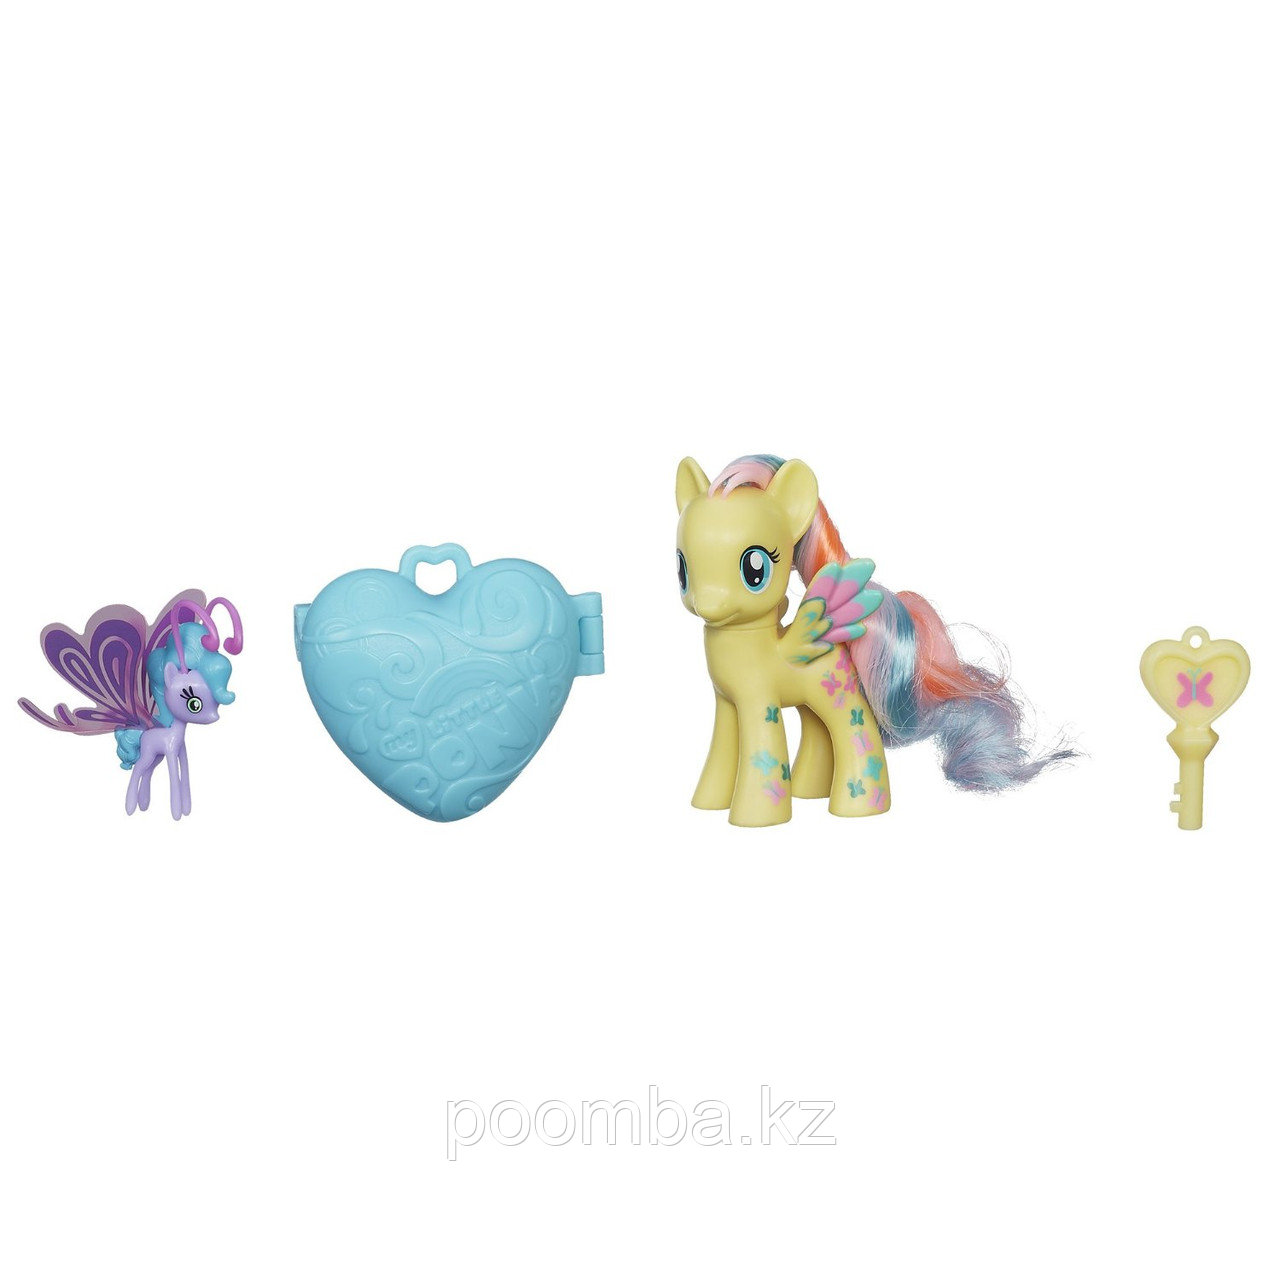 "Набор My little pony ""Пони и бризи"" - Флаттершай"